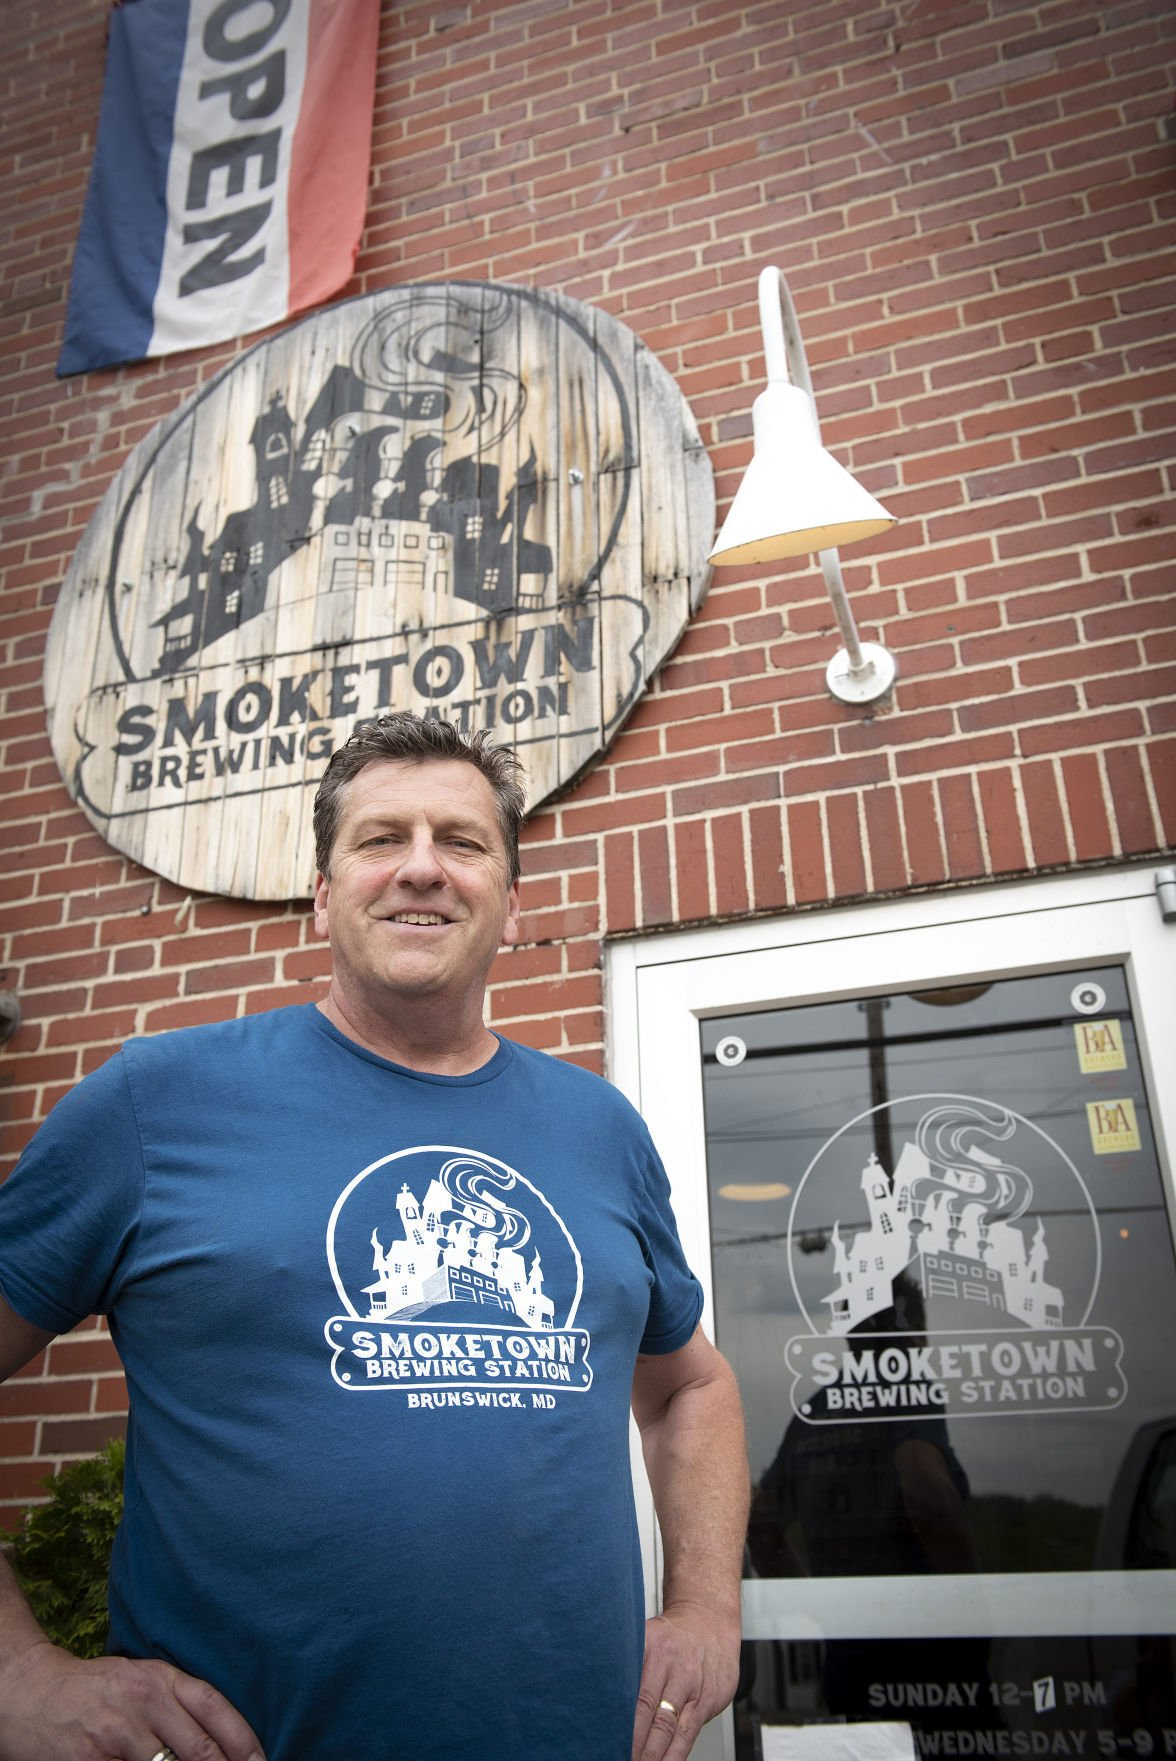 Smoketown Brewing (copy)